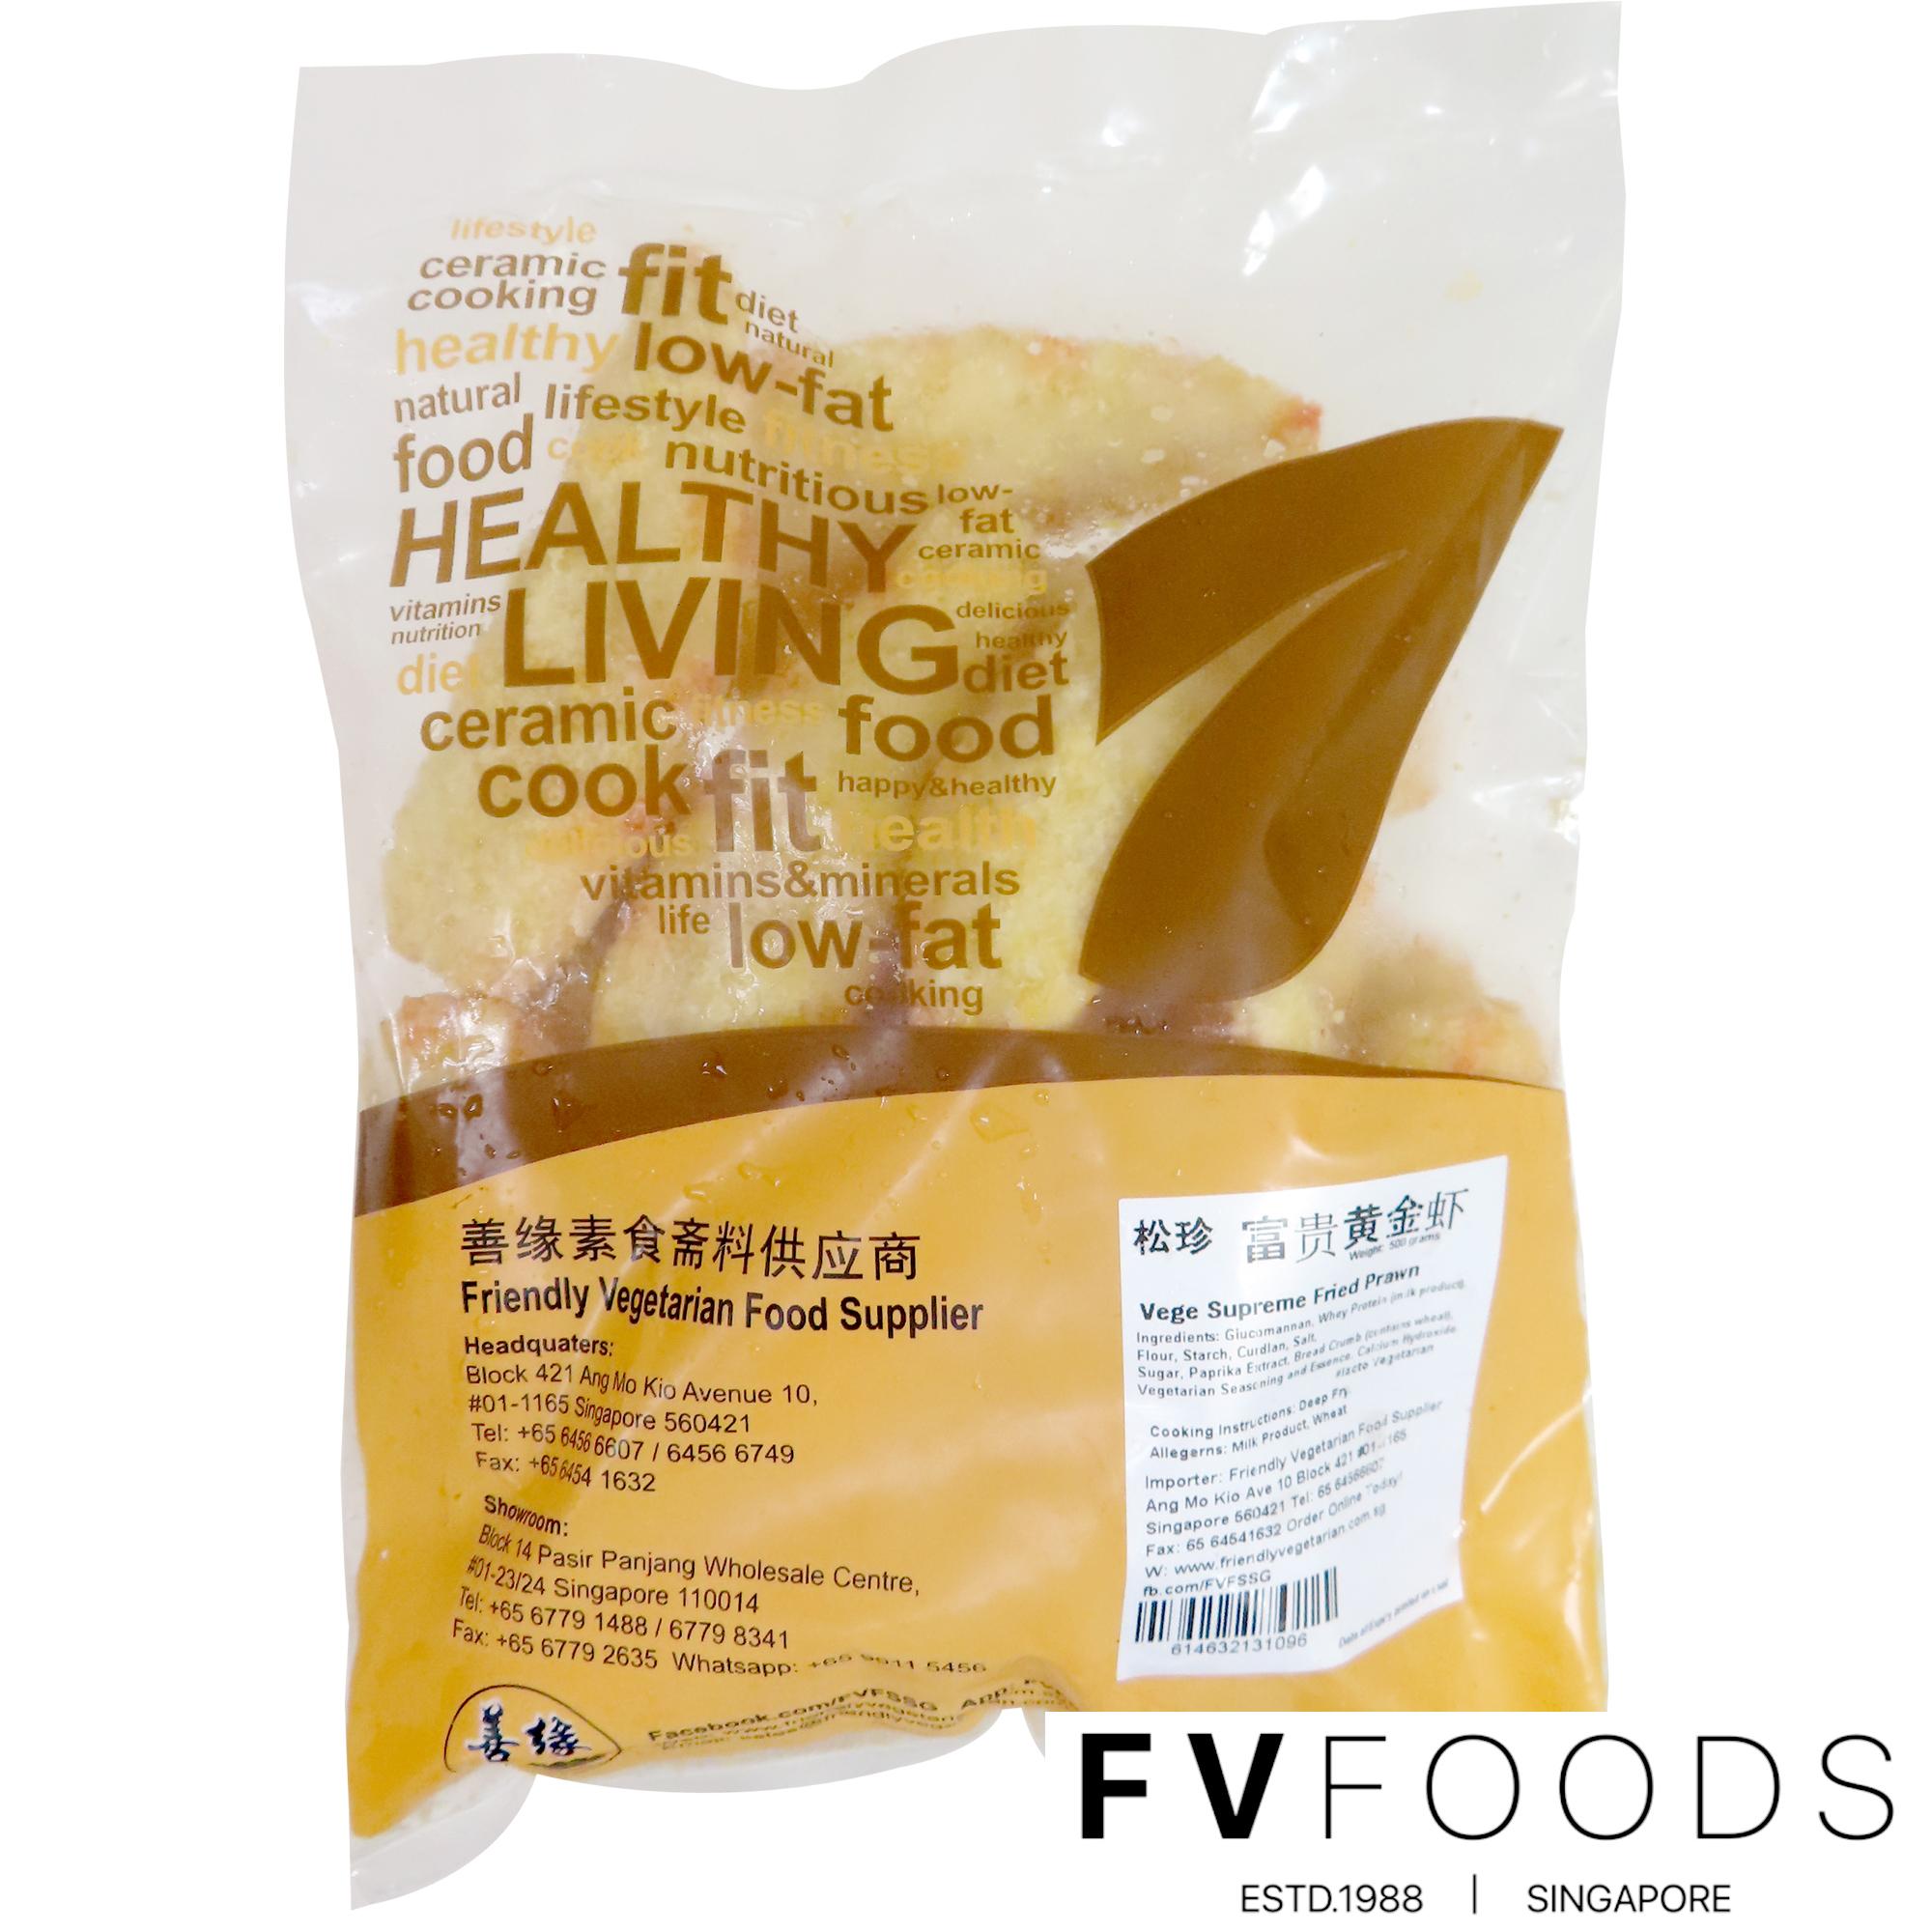 Image Vegefarm vege Supreme Fried Prawn 松珍-富贵黄金虾 500grams